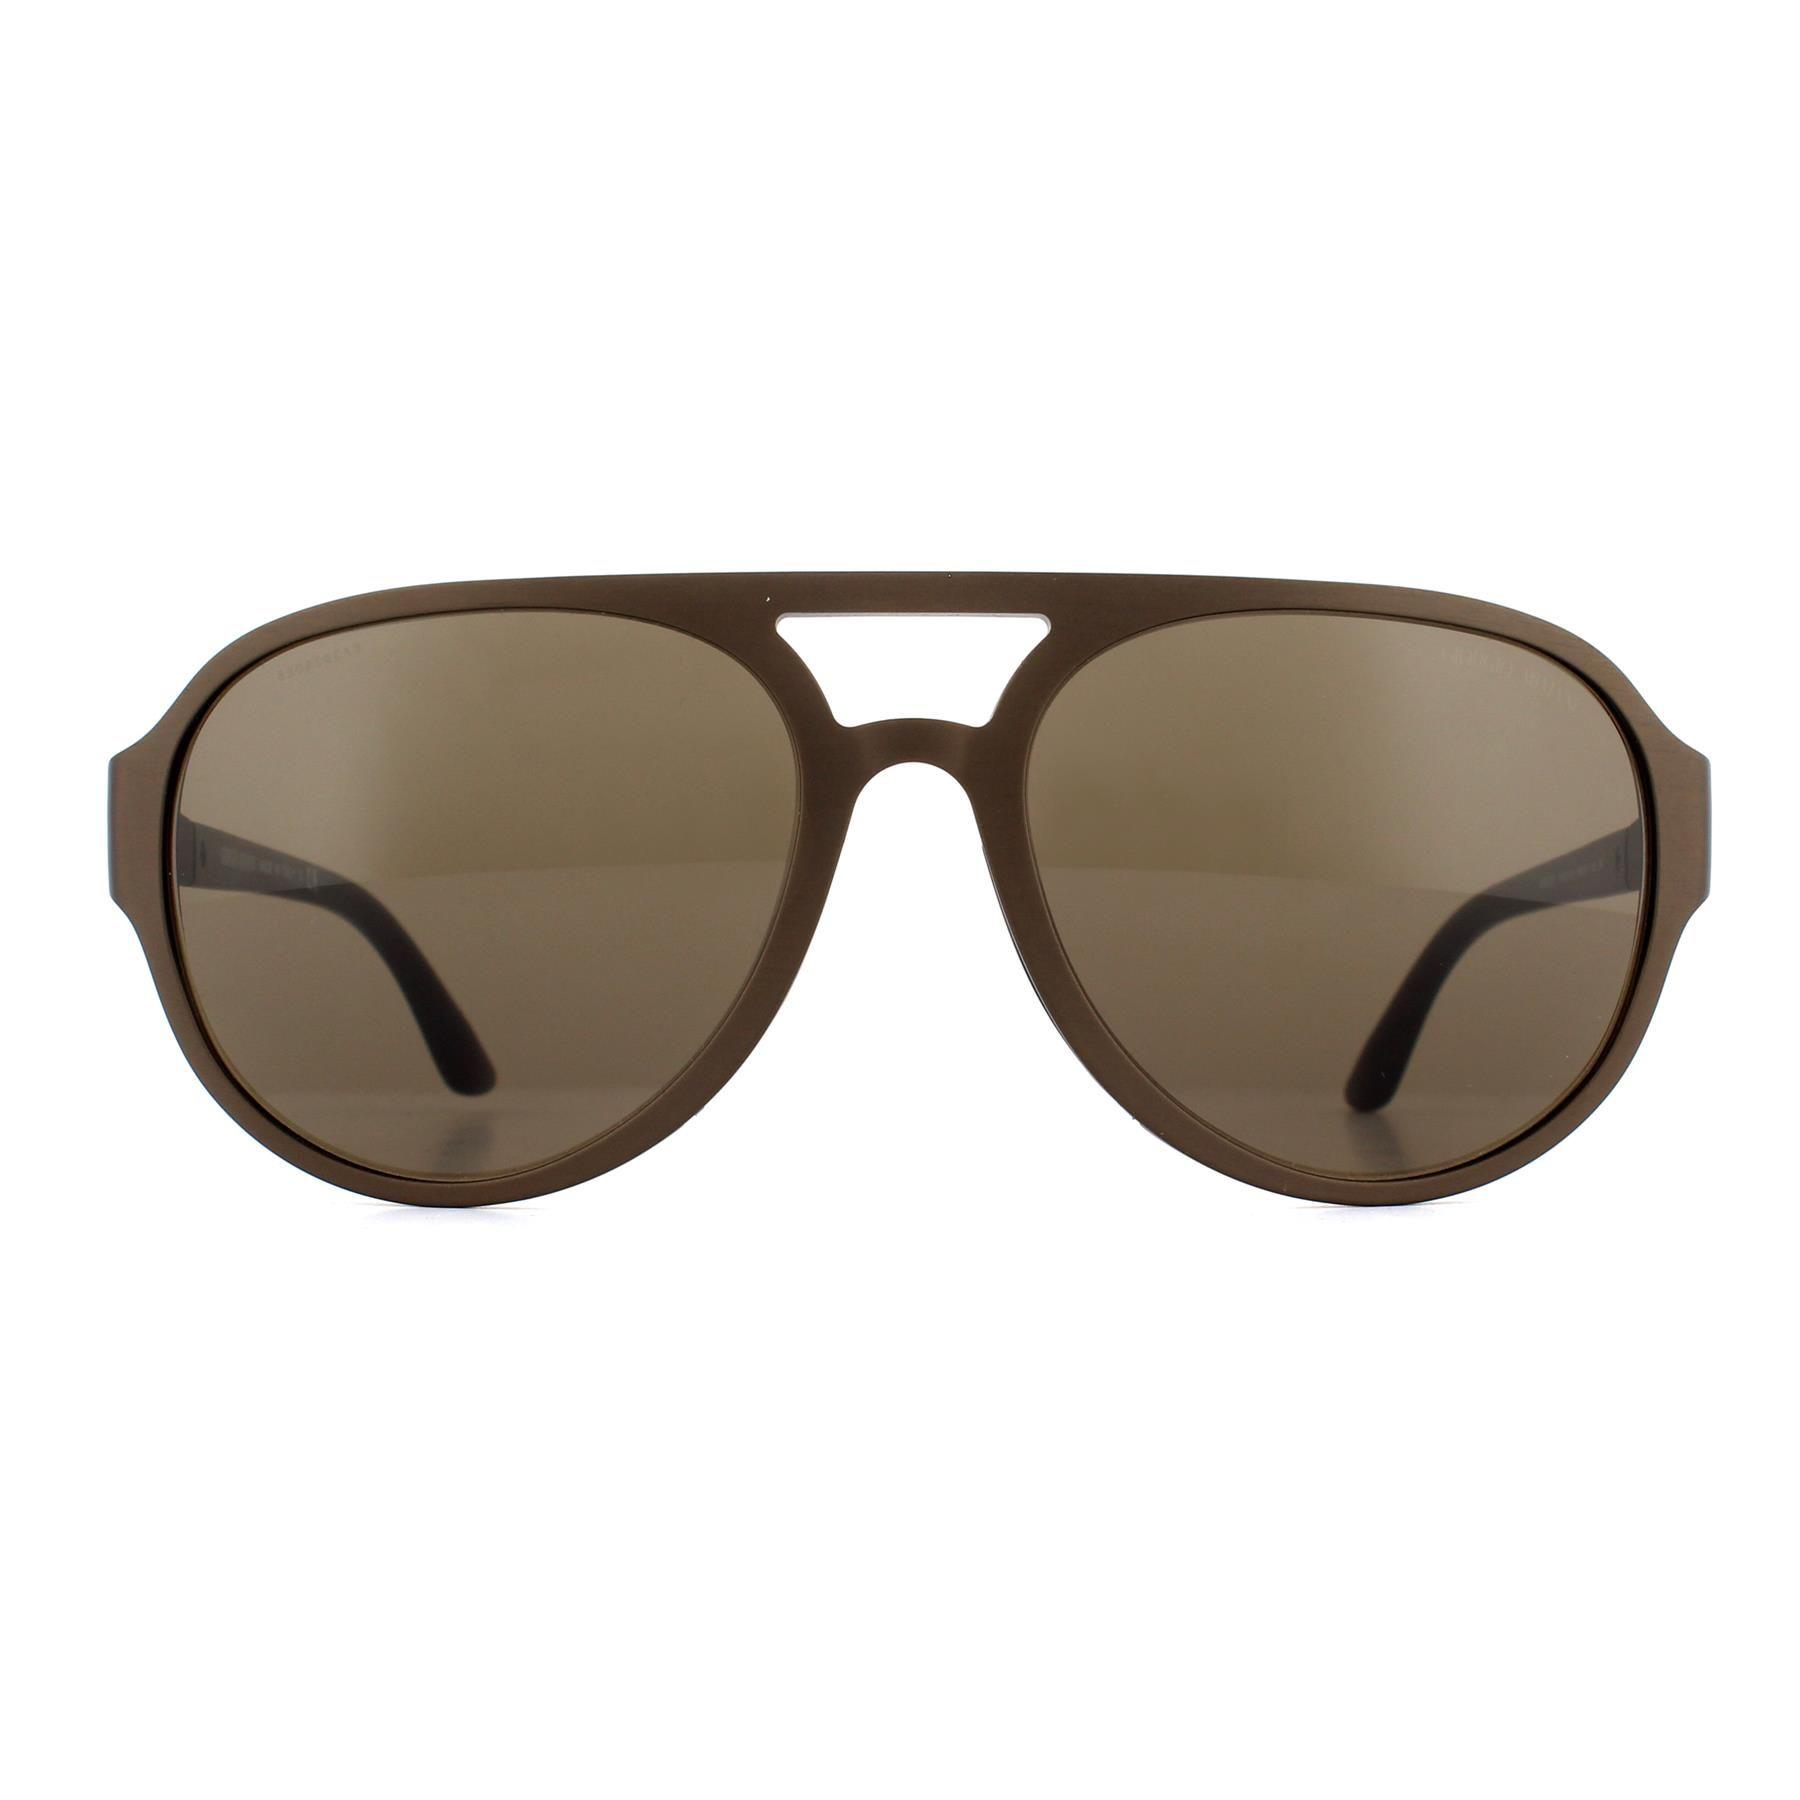 Giorgio Armani Sunglasses AR6037 315173 Brushed Brown Brown